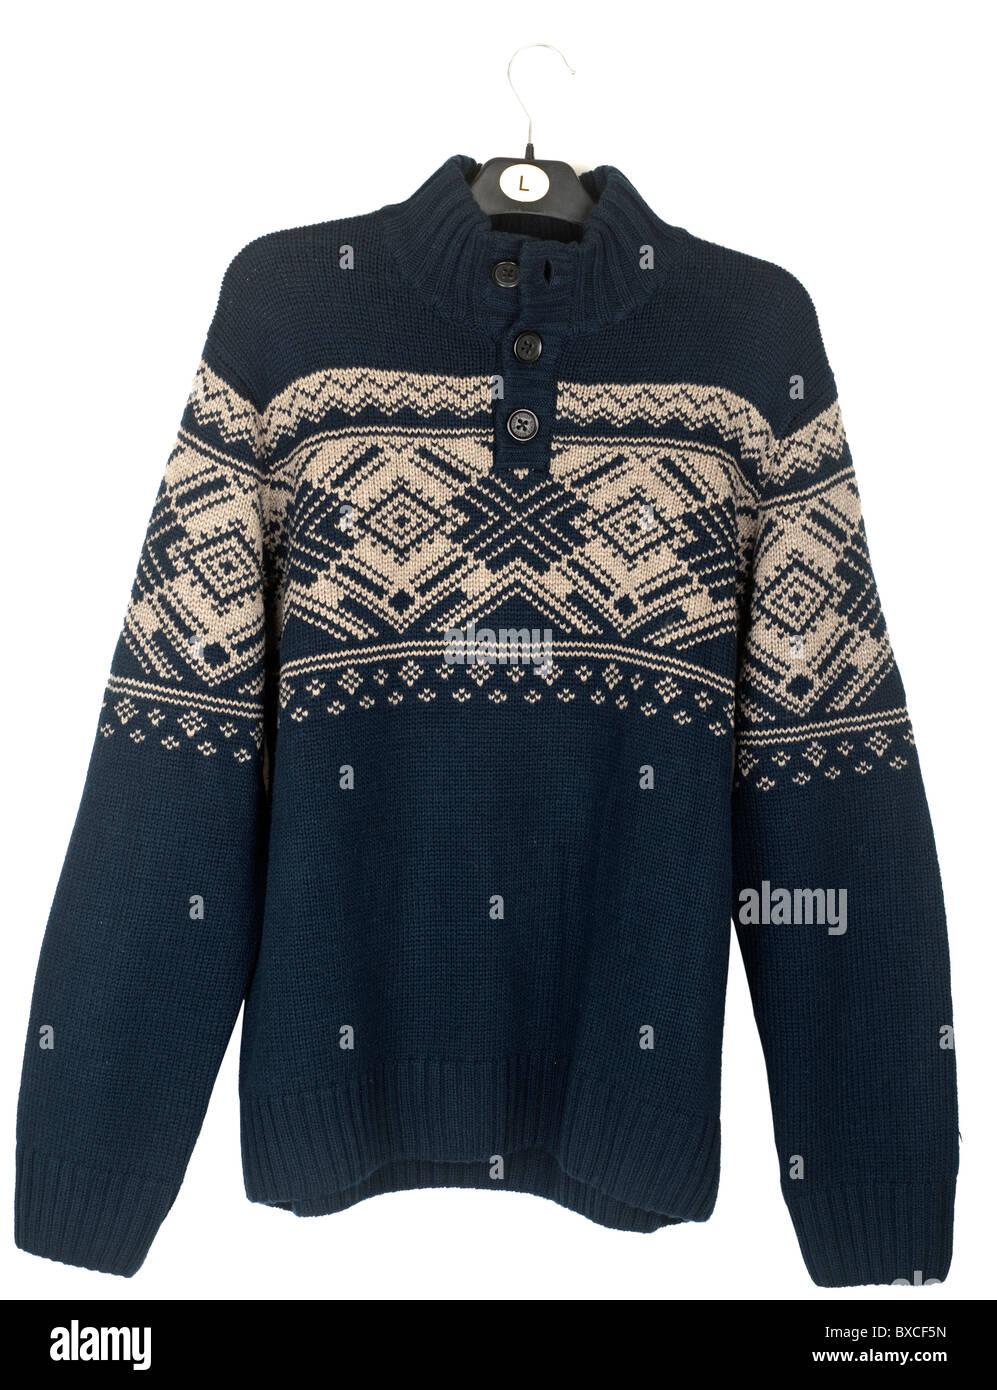 Mens large quarter buttoned blue patterned pullover - Stock Image